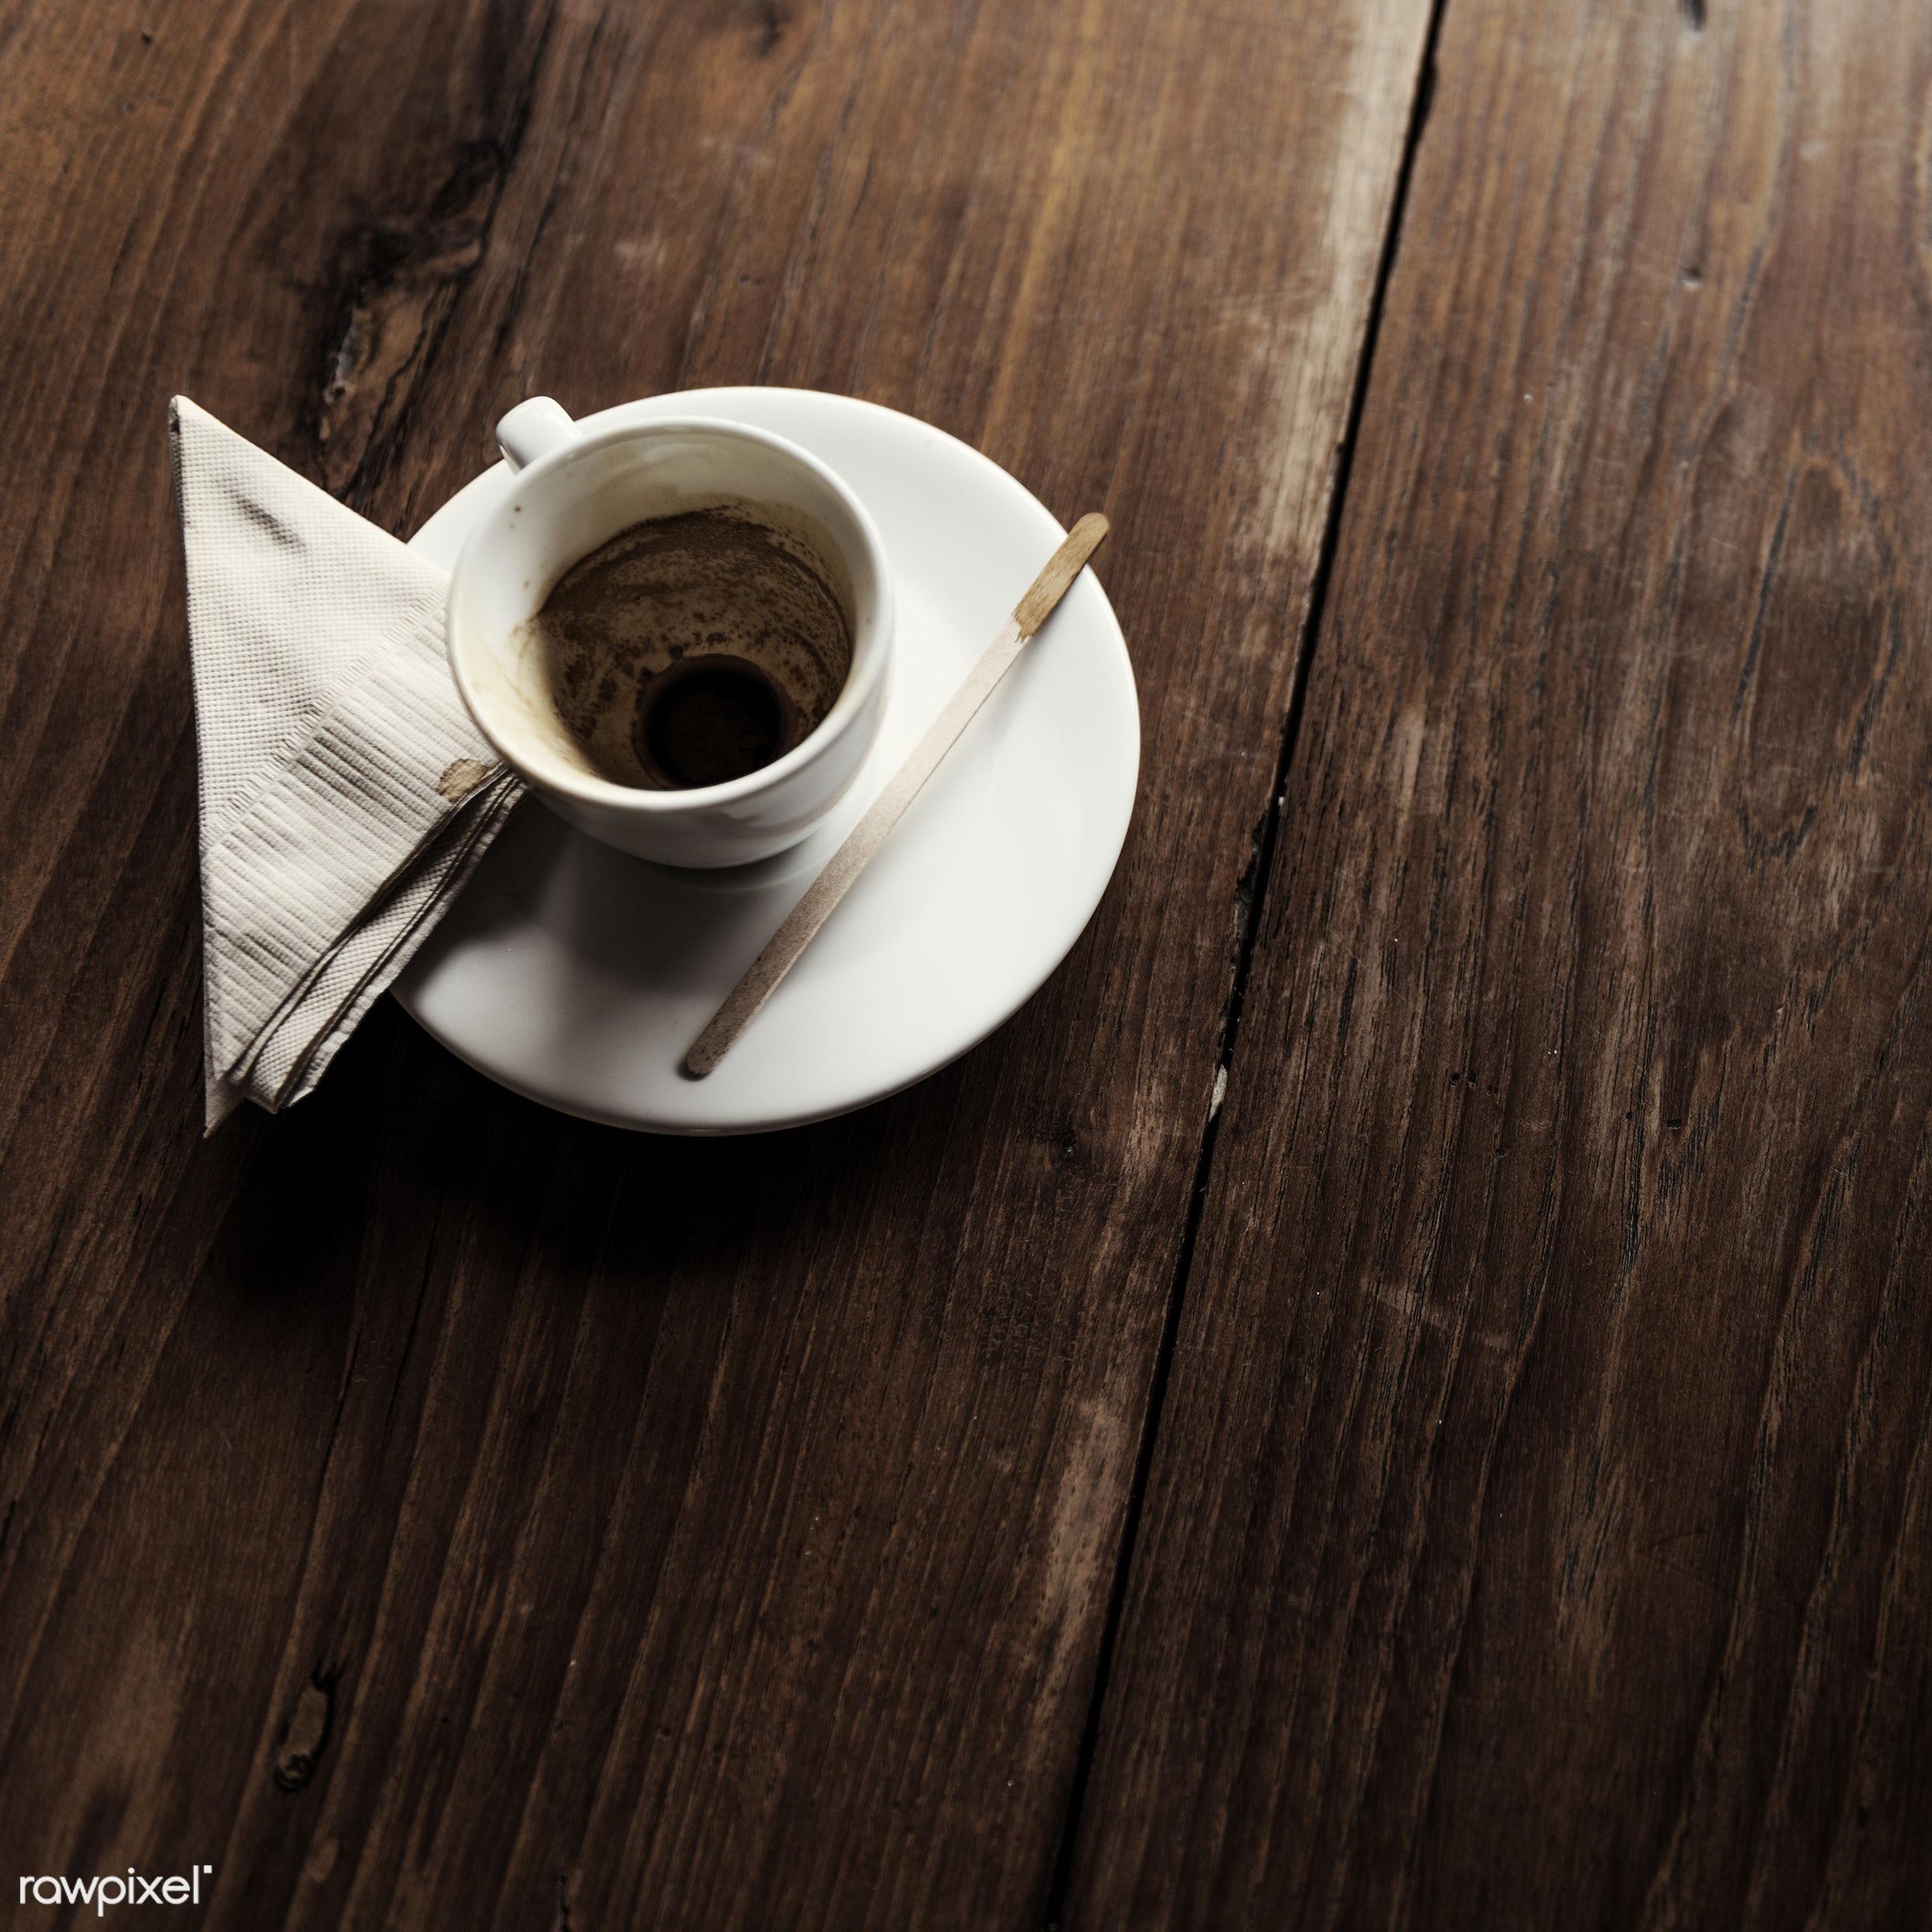 barista, beverage, break, cafe, caffeine, calm, casual, cheerful, chill, chill out, coffee, coffee beans, coffee break,...